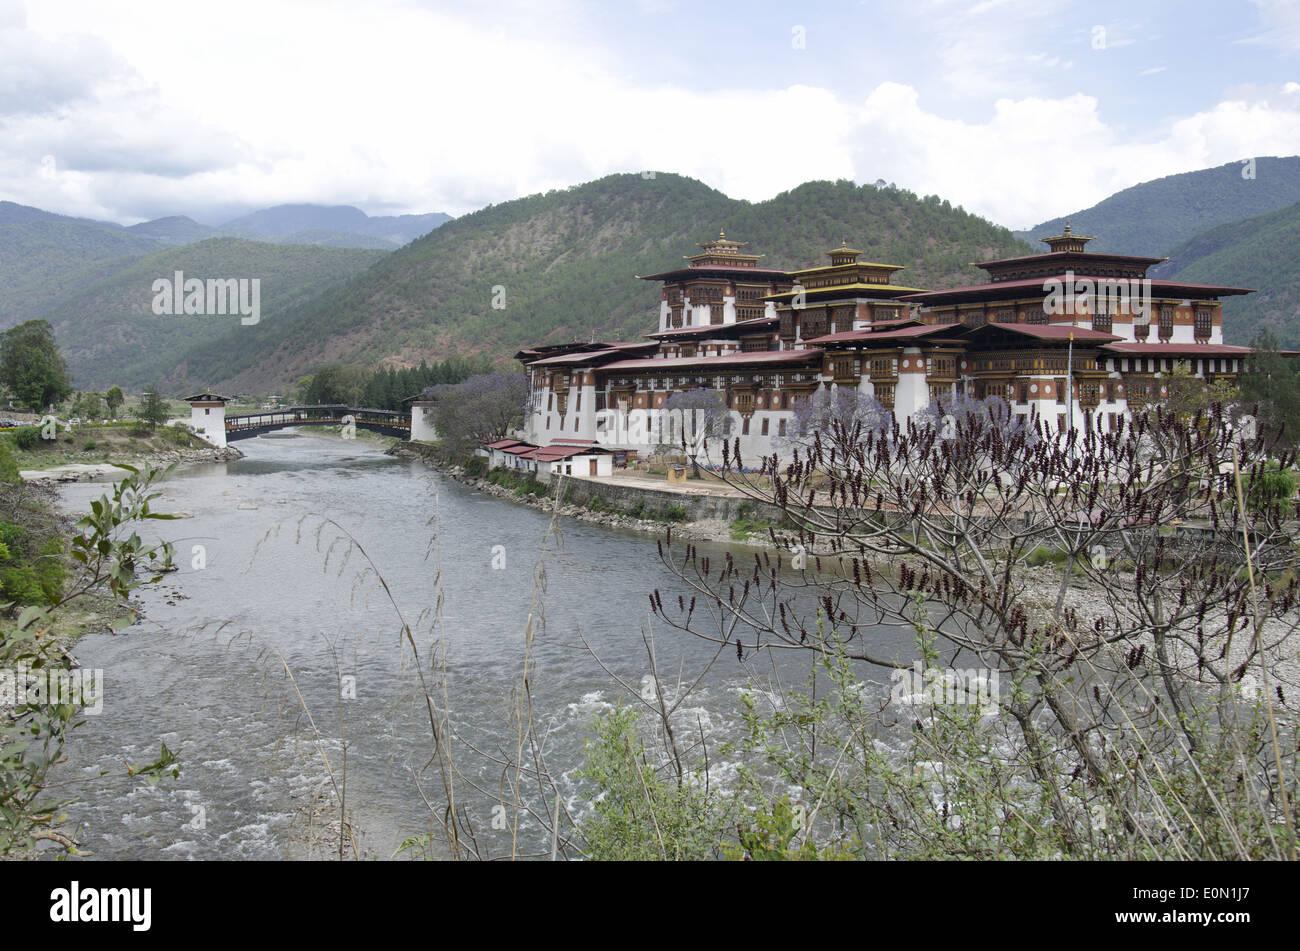 A view of Punakha Dzong, also known as Pungtang Dechen Photrang Dzong, Punakha, Bhutan - Stock Image